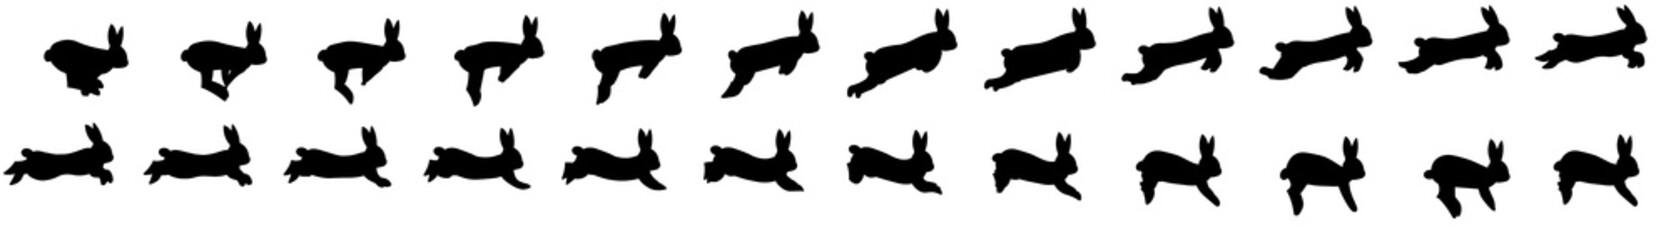 Rabbit run cycle animation spritesheet